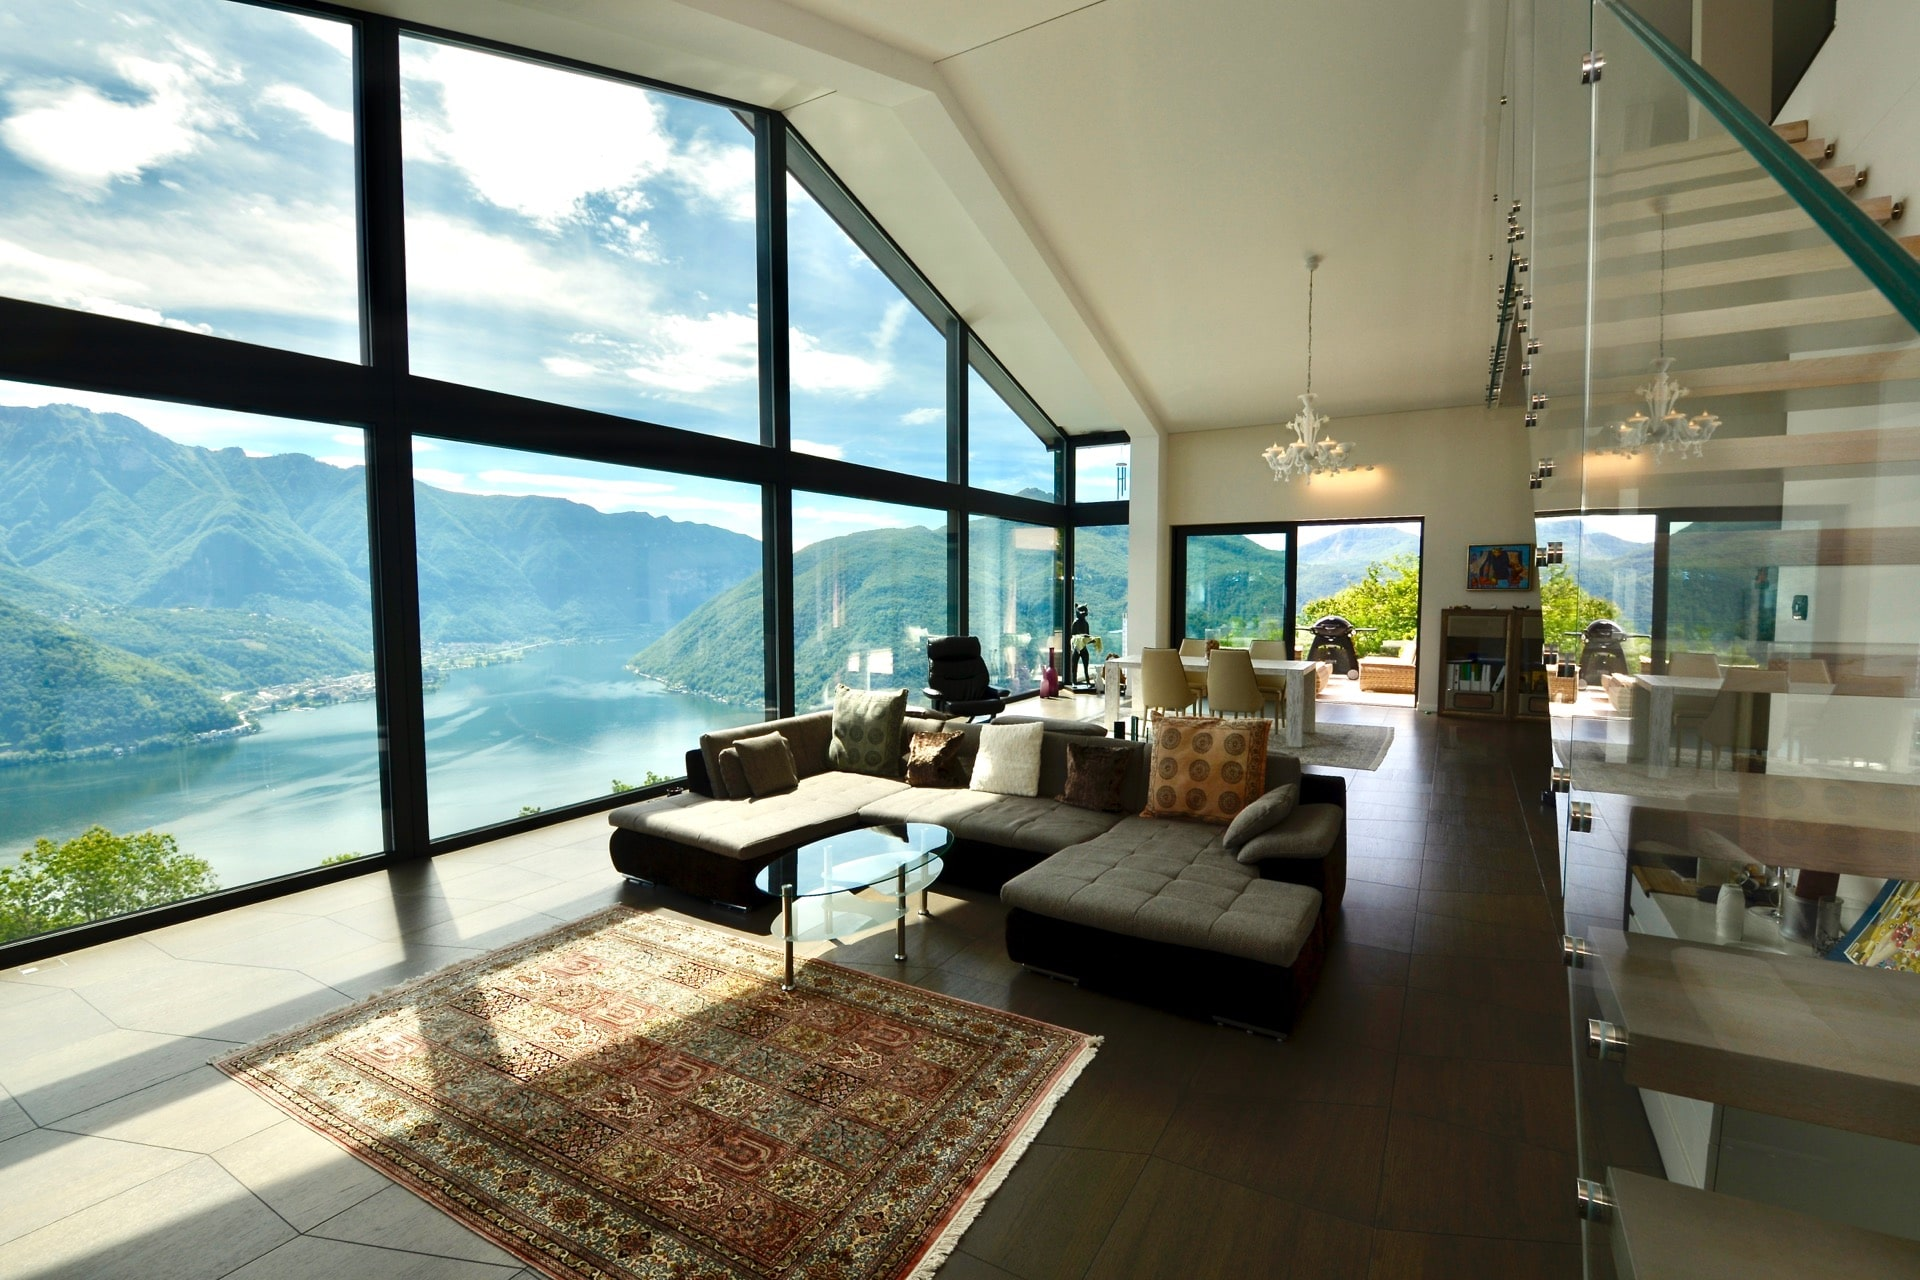 Luxury real estate in Carona, Switzerland for sale